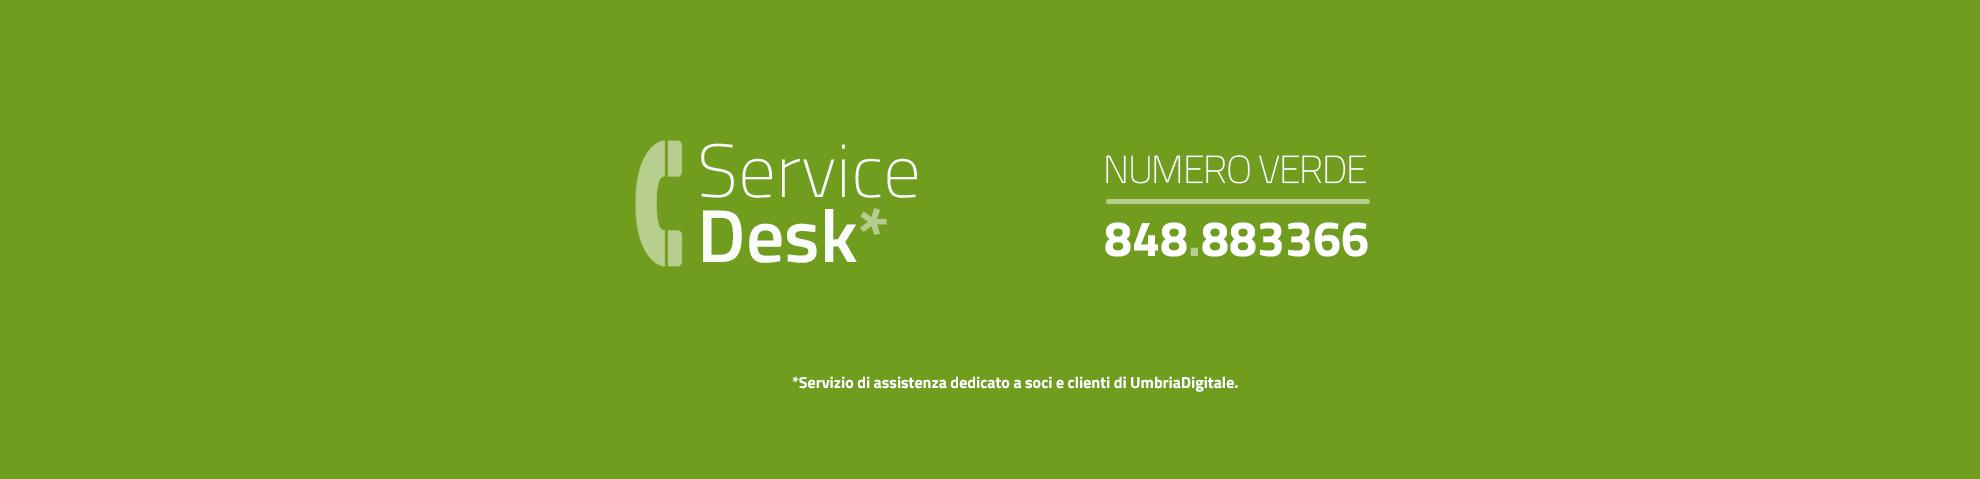 Service Desk 848.883366